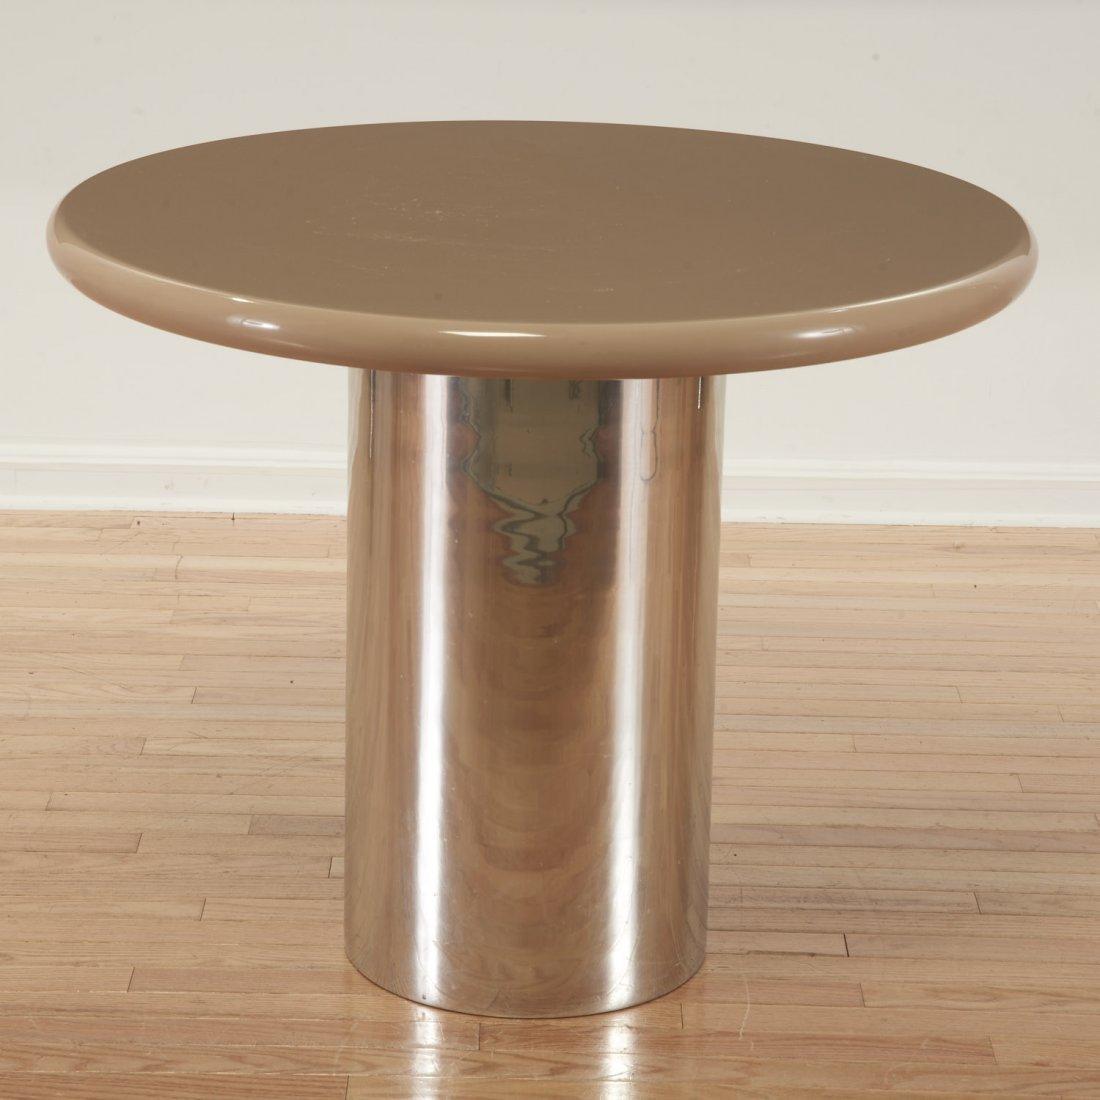 Karl Springer style chrome, acrylic dining table - 4